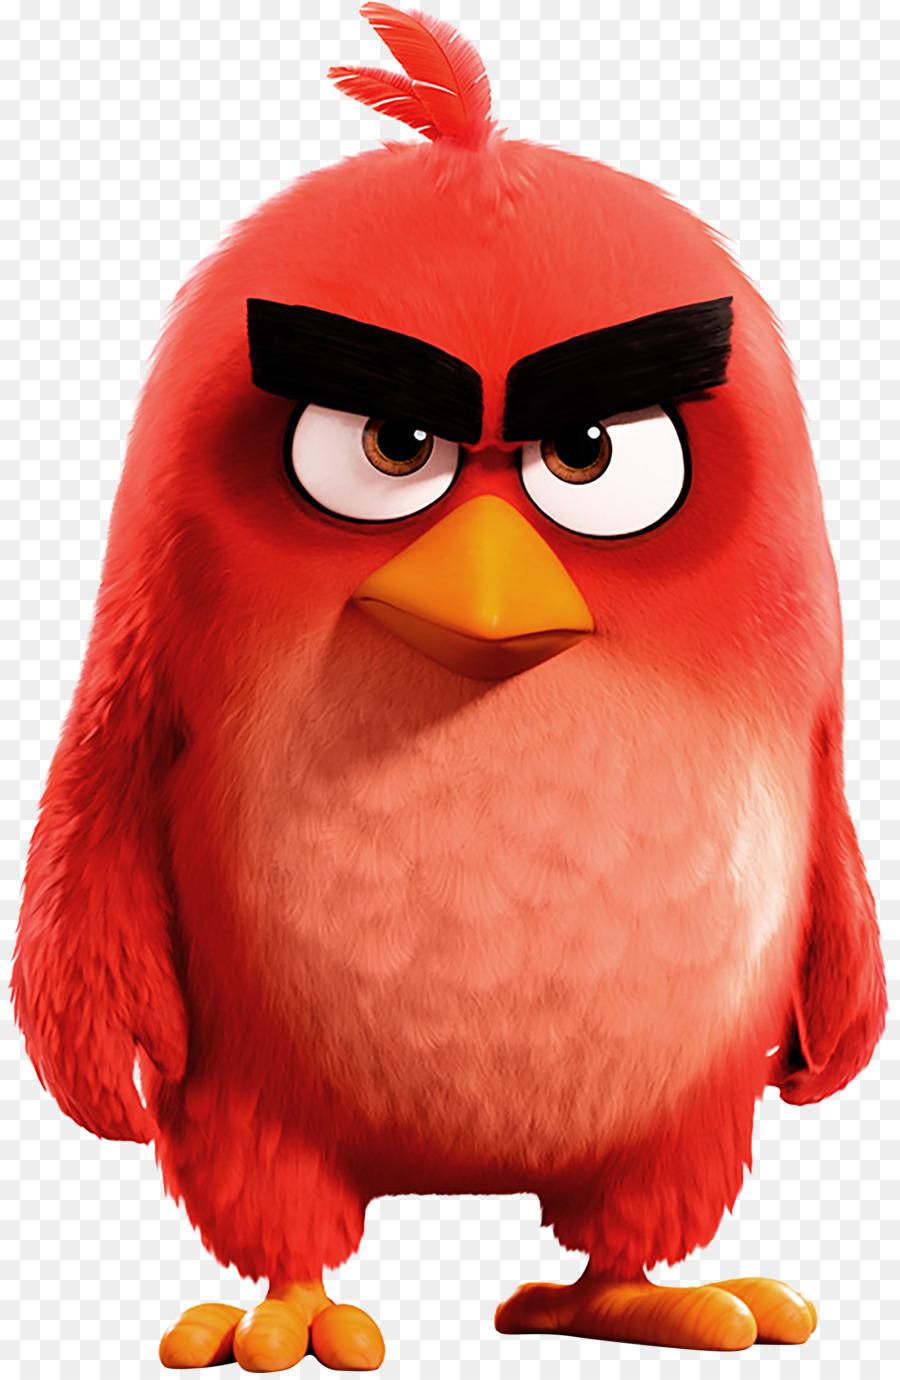 Descarga gratuita de Angry Birds Epic, Angry Birds 2, Angry Birds Go imágenes PNG